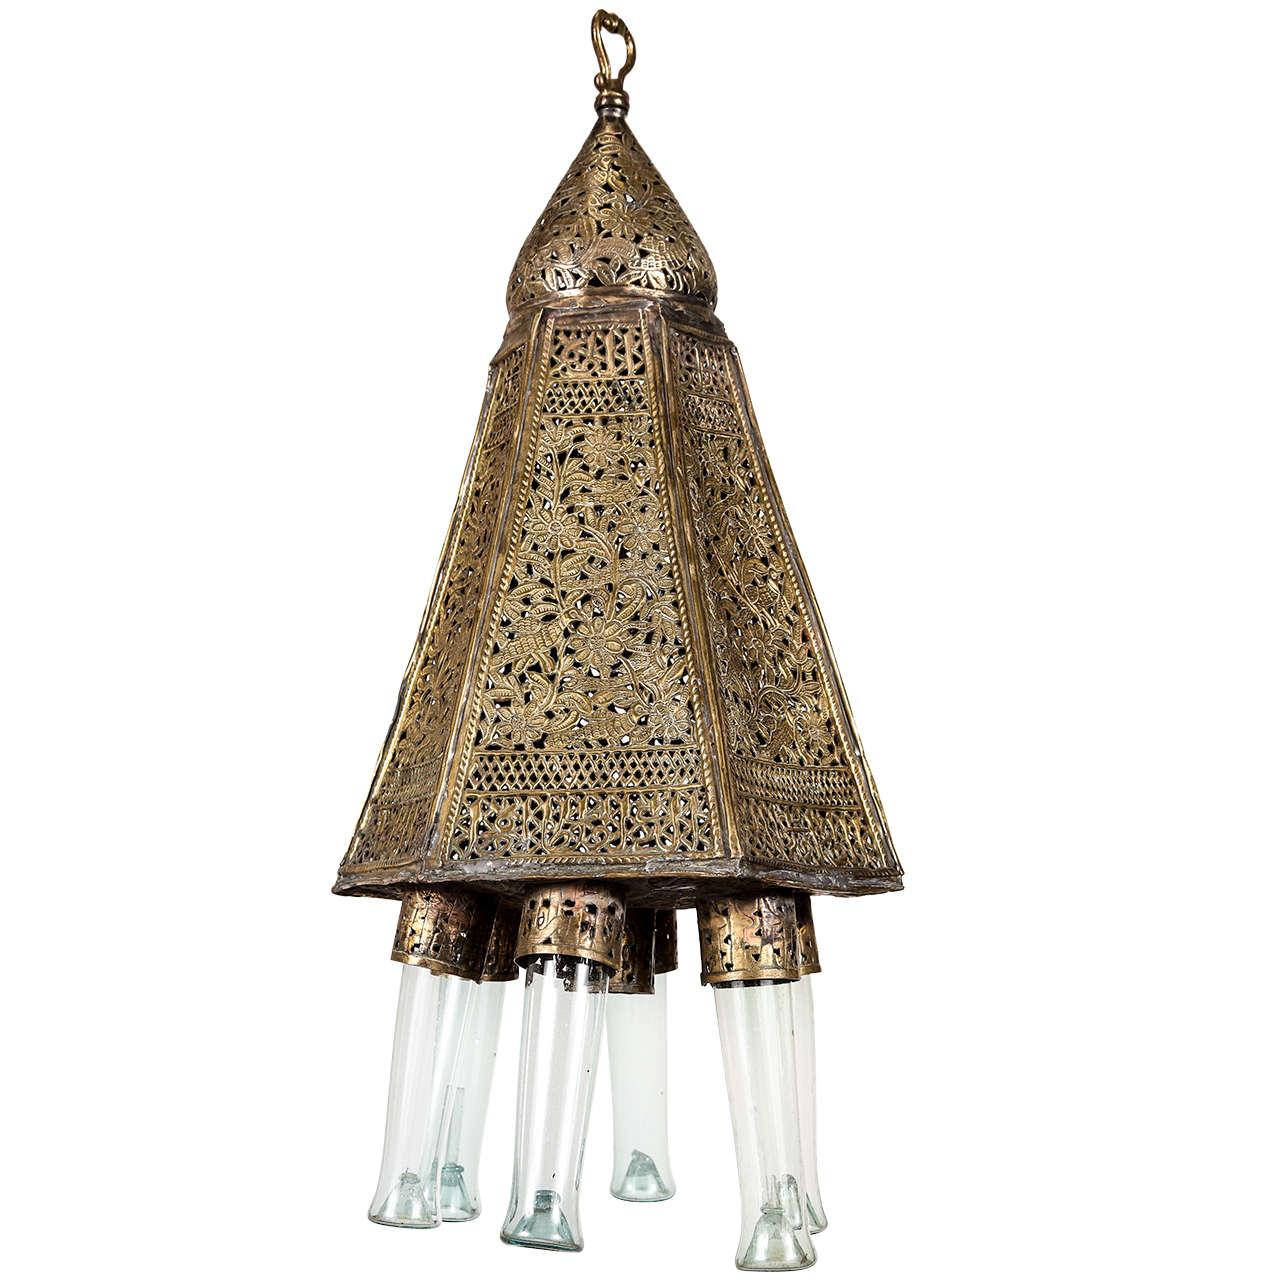 Antique Moorish Style Turkish Mosque Lamp At 1stdibs